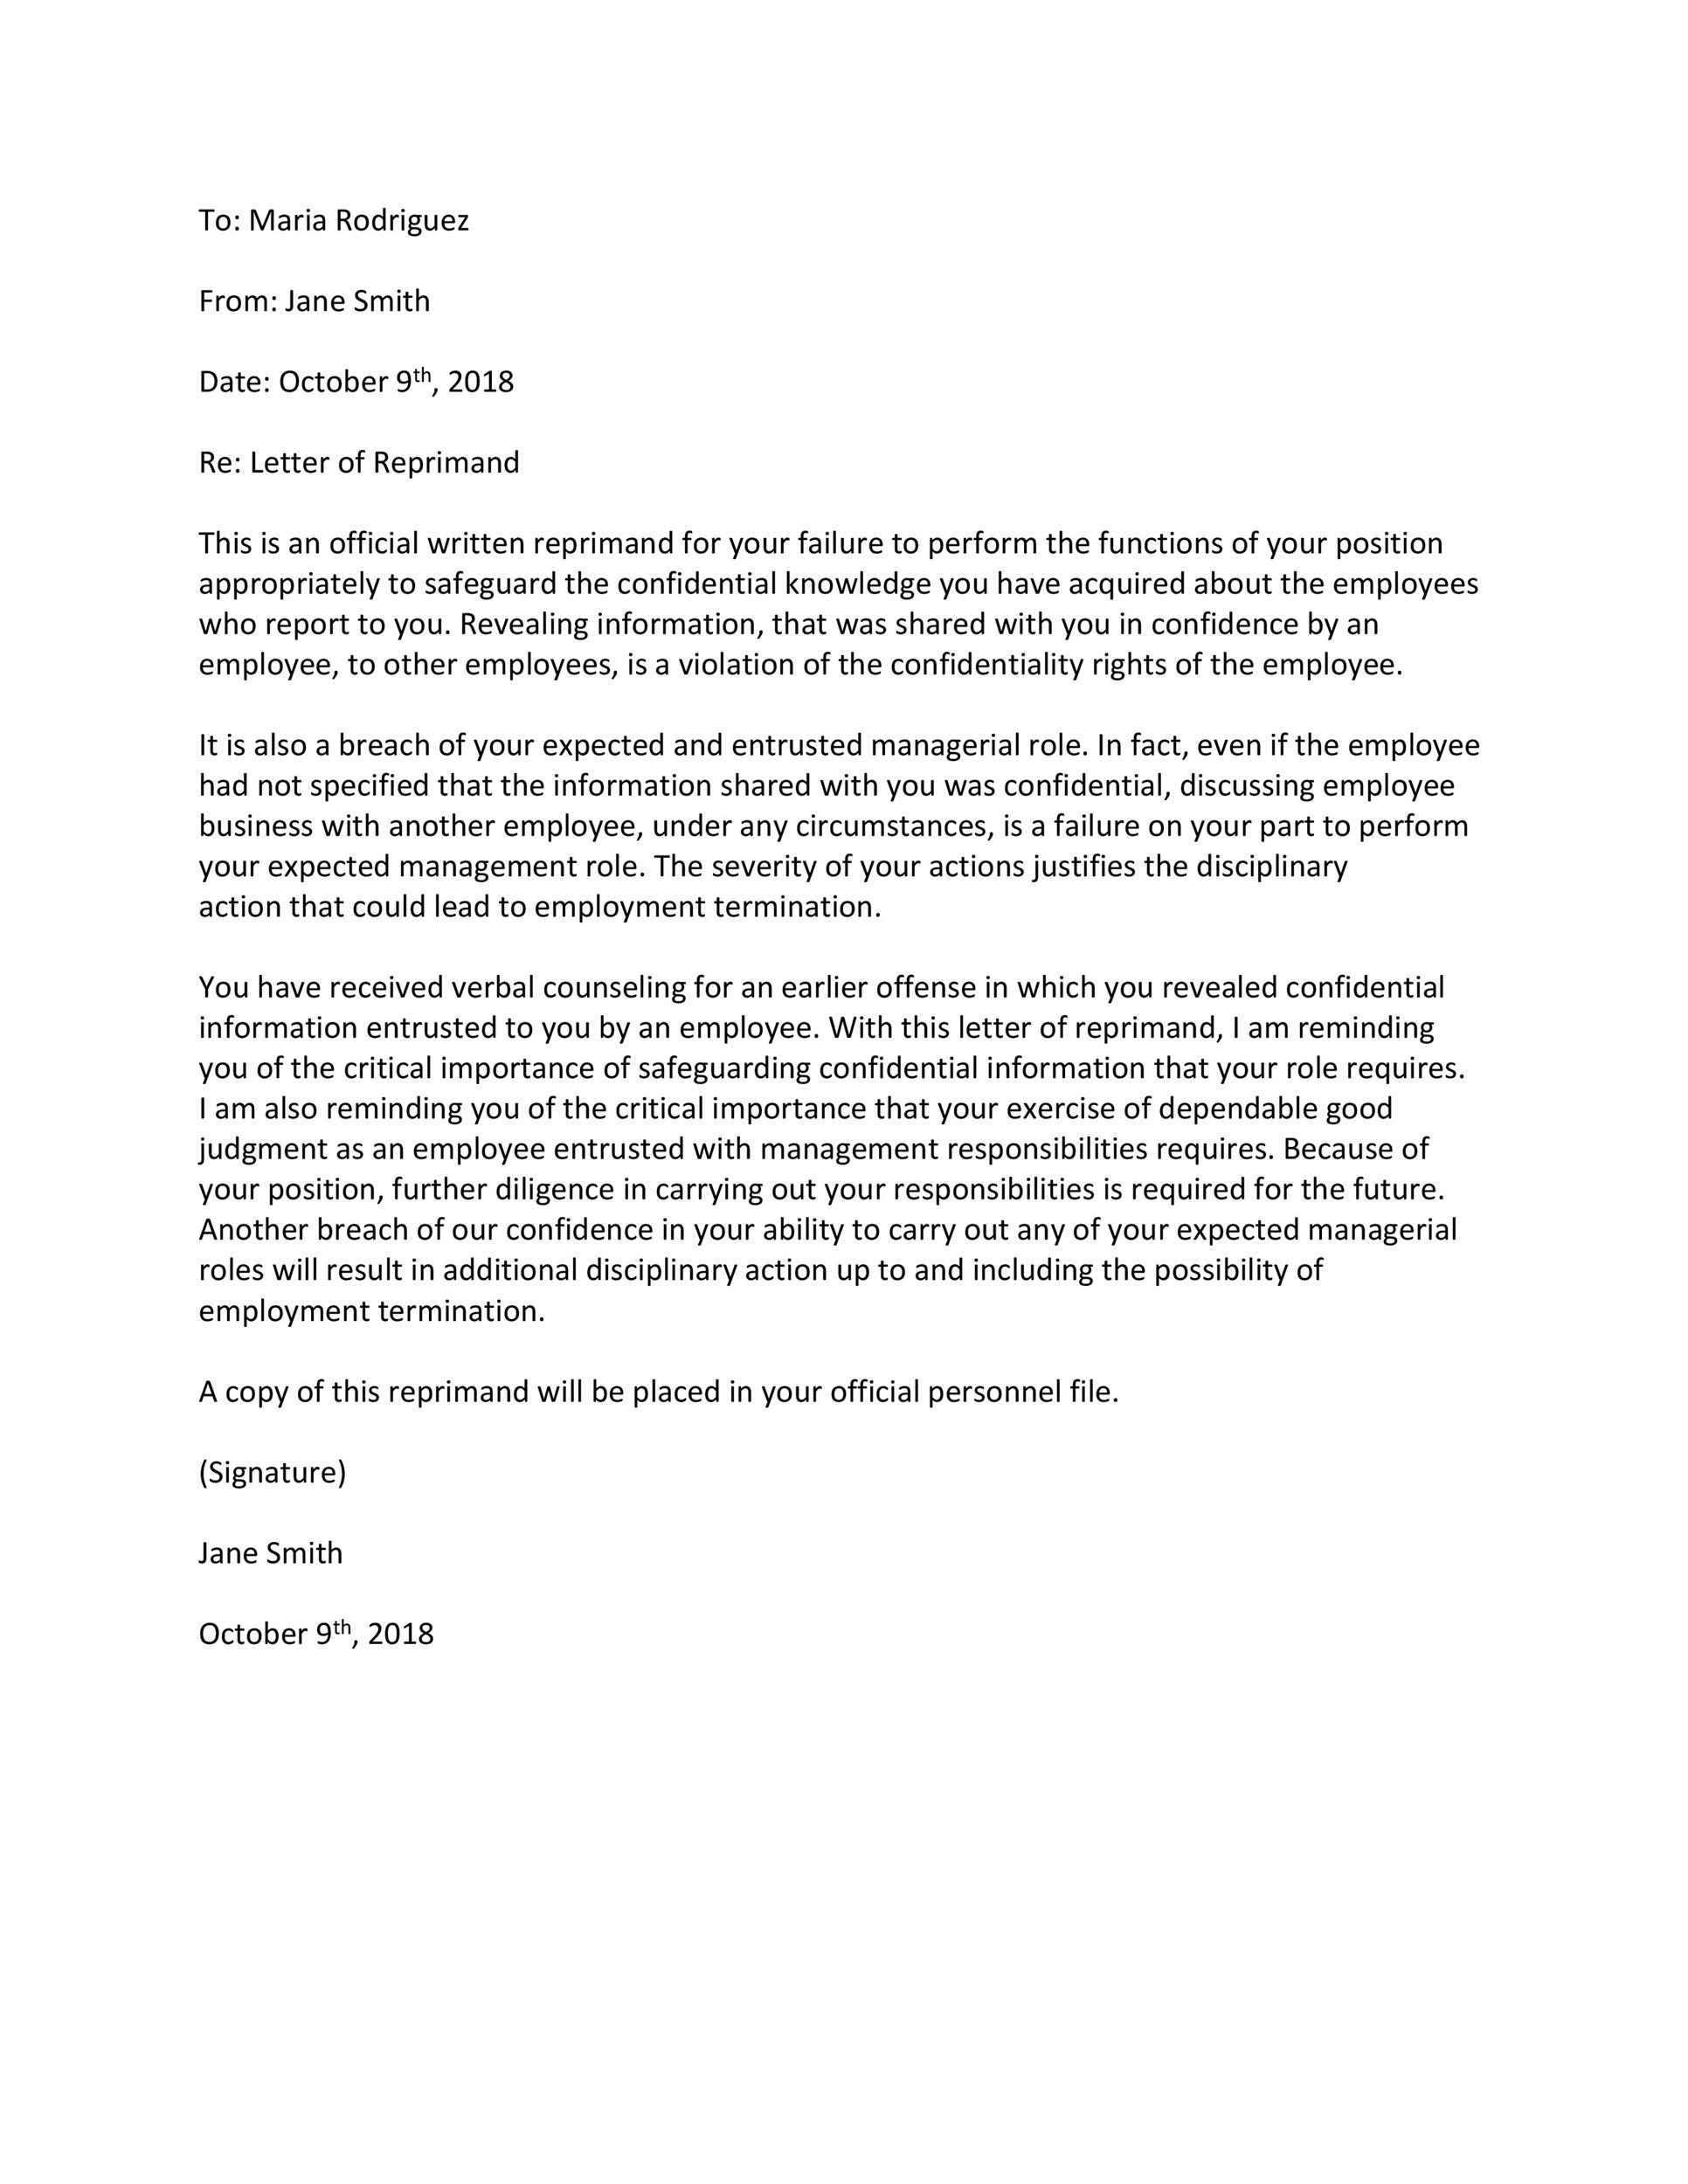 Letter Of Reprimand Teacher from templatelab.com